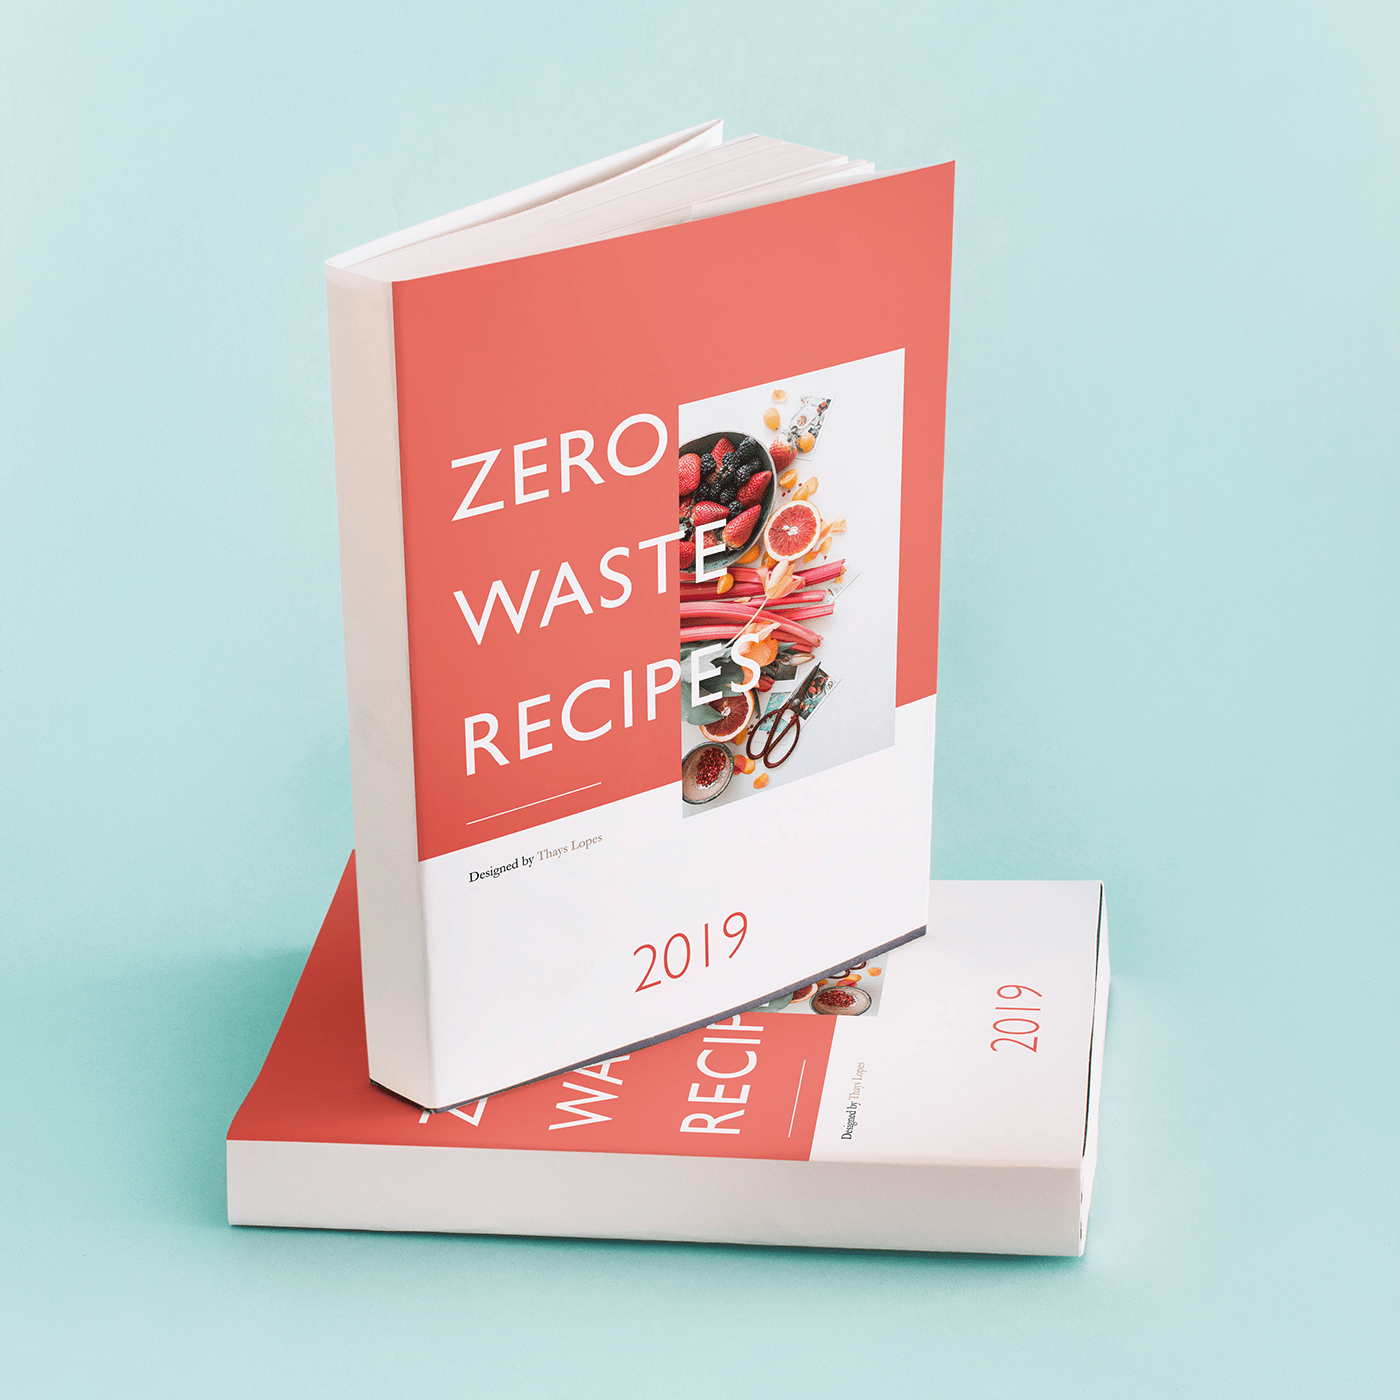 cookbook book recipes design graphic design  editorial publication Food waste waste environment